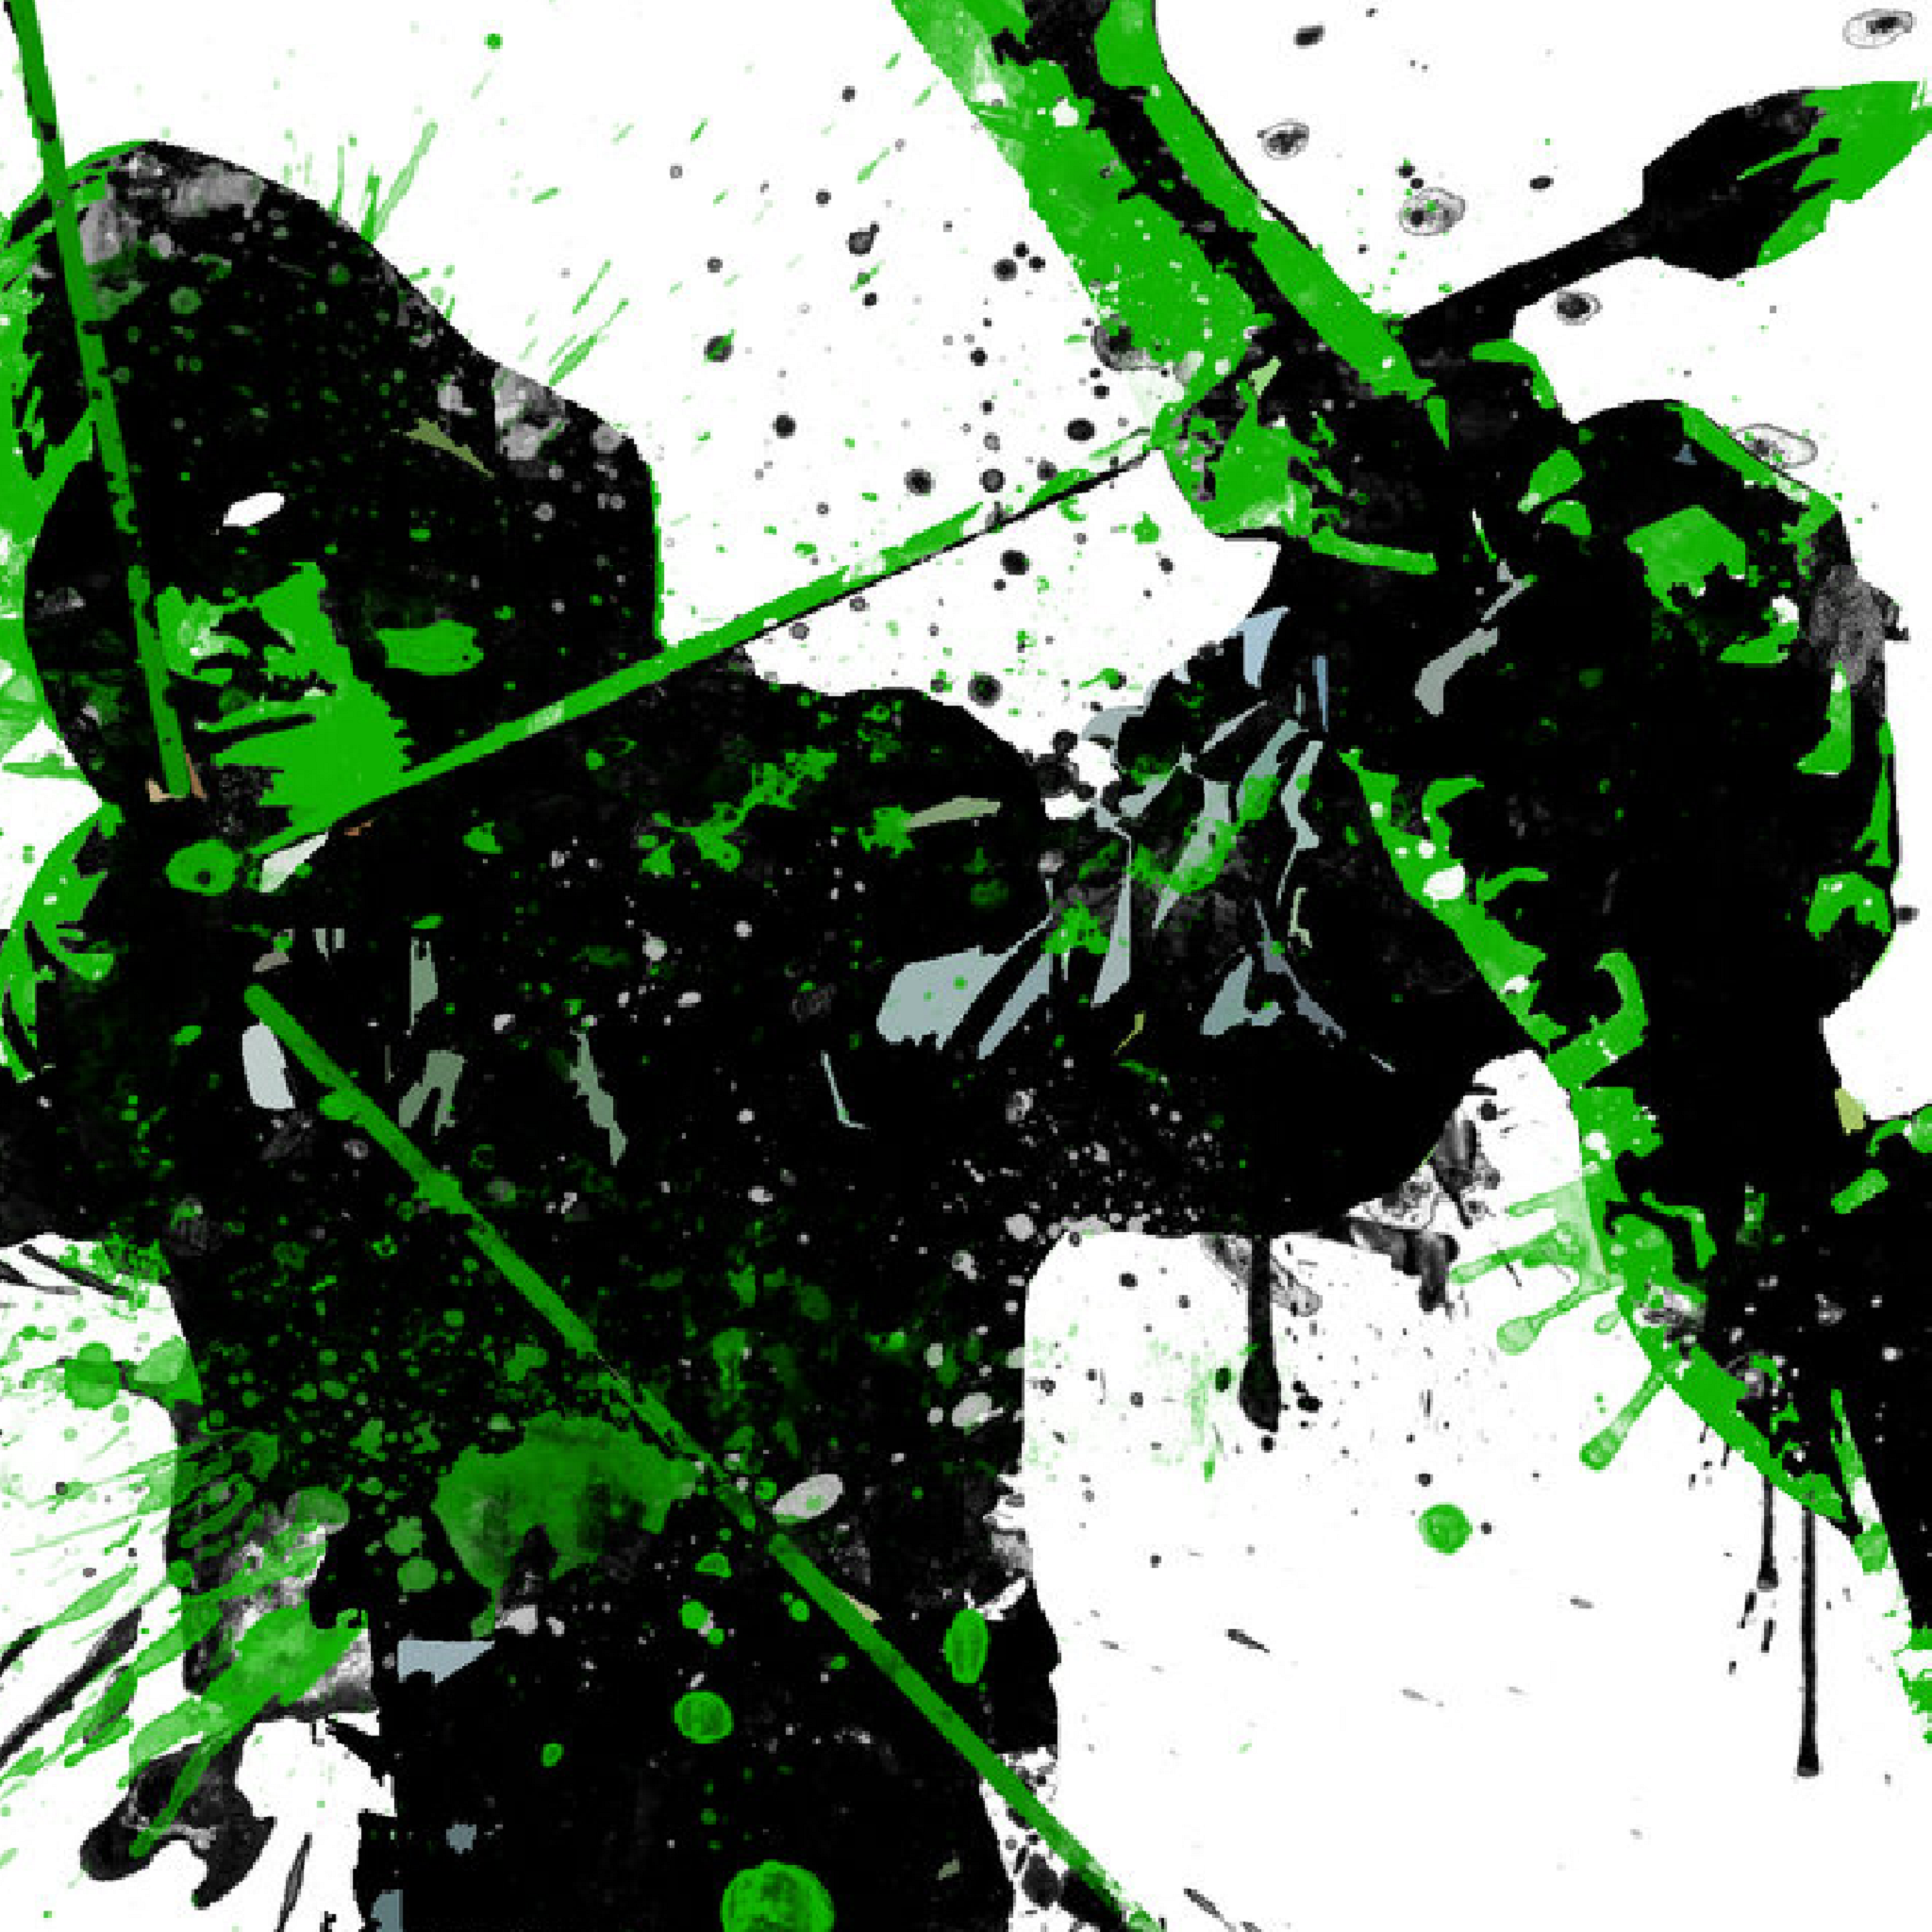 Green Arrow Tap To See More Beautiful Splash Art Abstract Wallpapers Mobile9 Arrow Poster Green Arrow Arrow Artwork